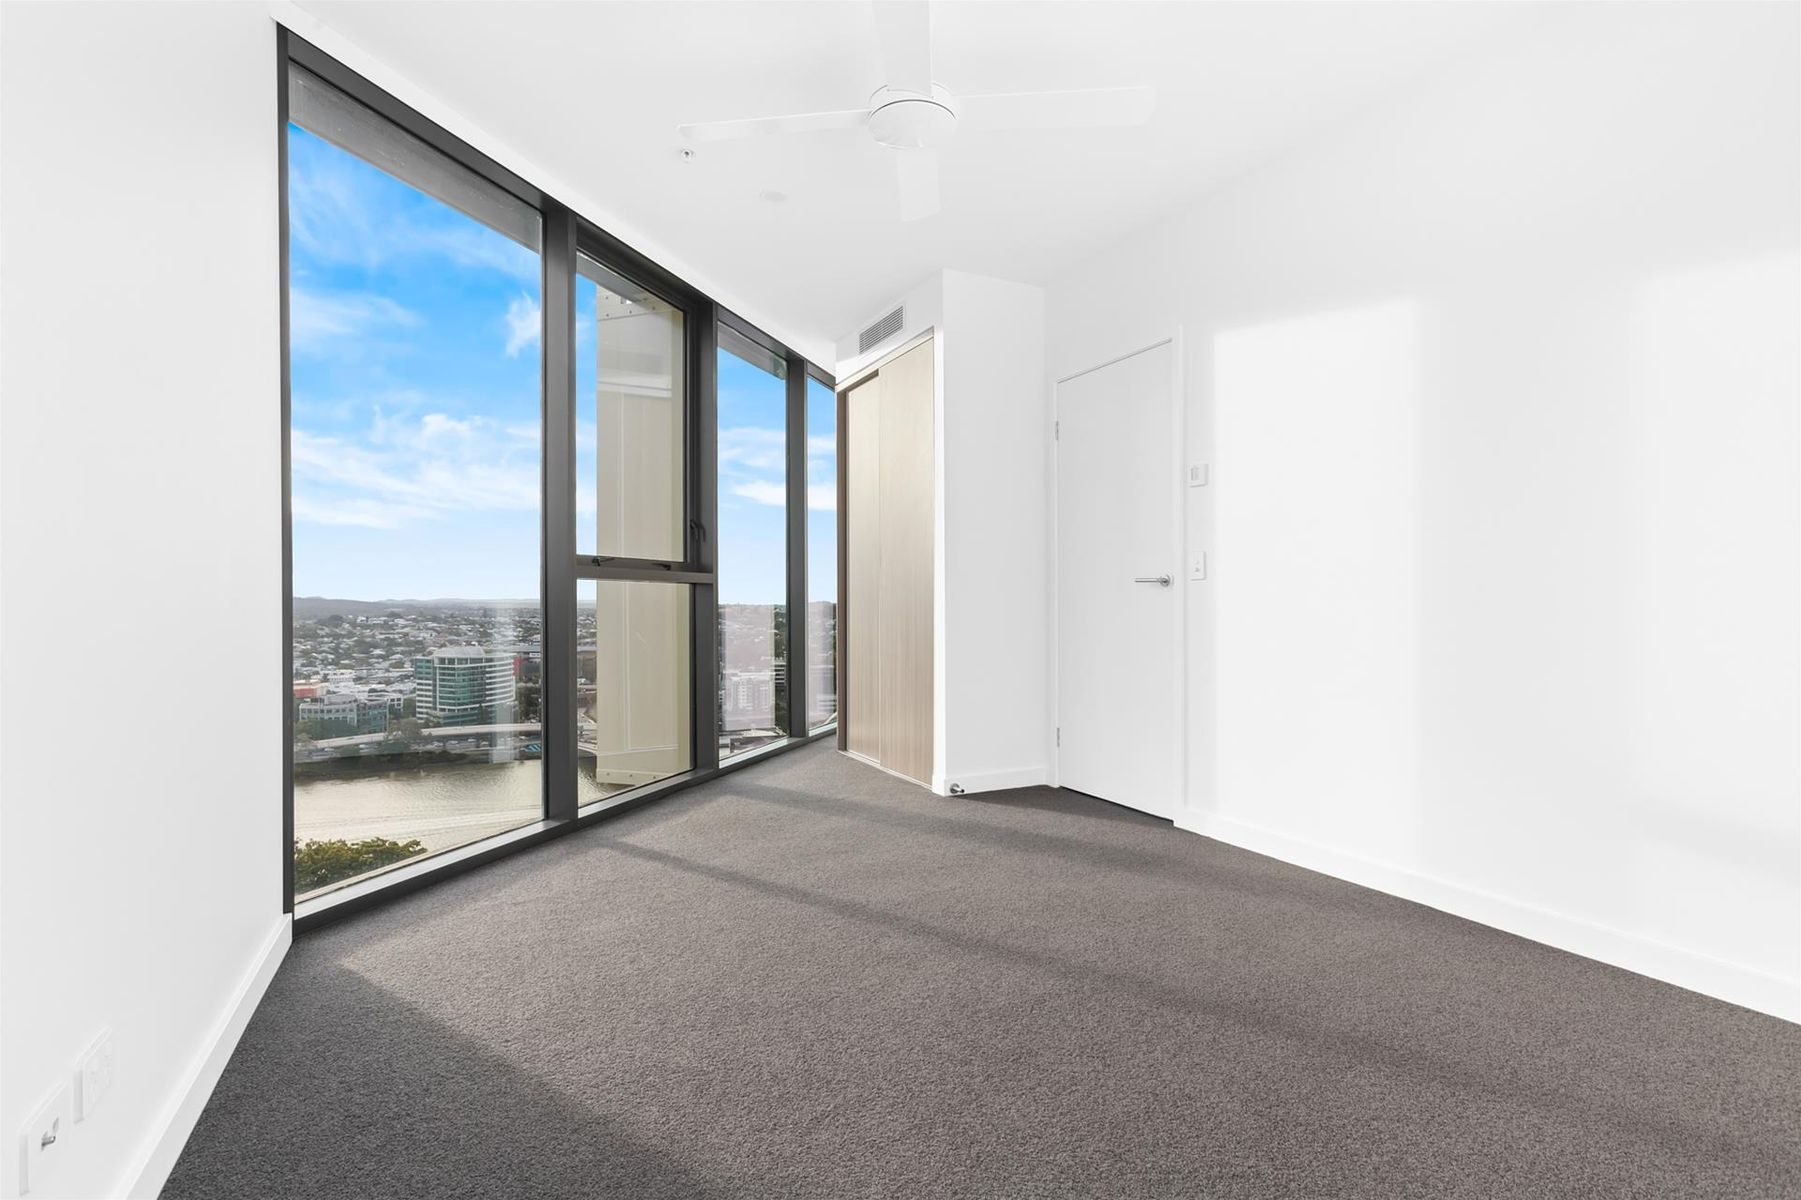 32802/1 Cordelia Street, South Brisbane, QLD 4101